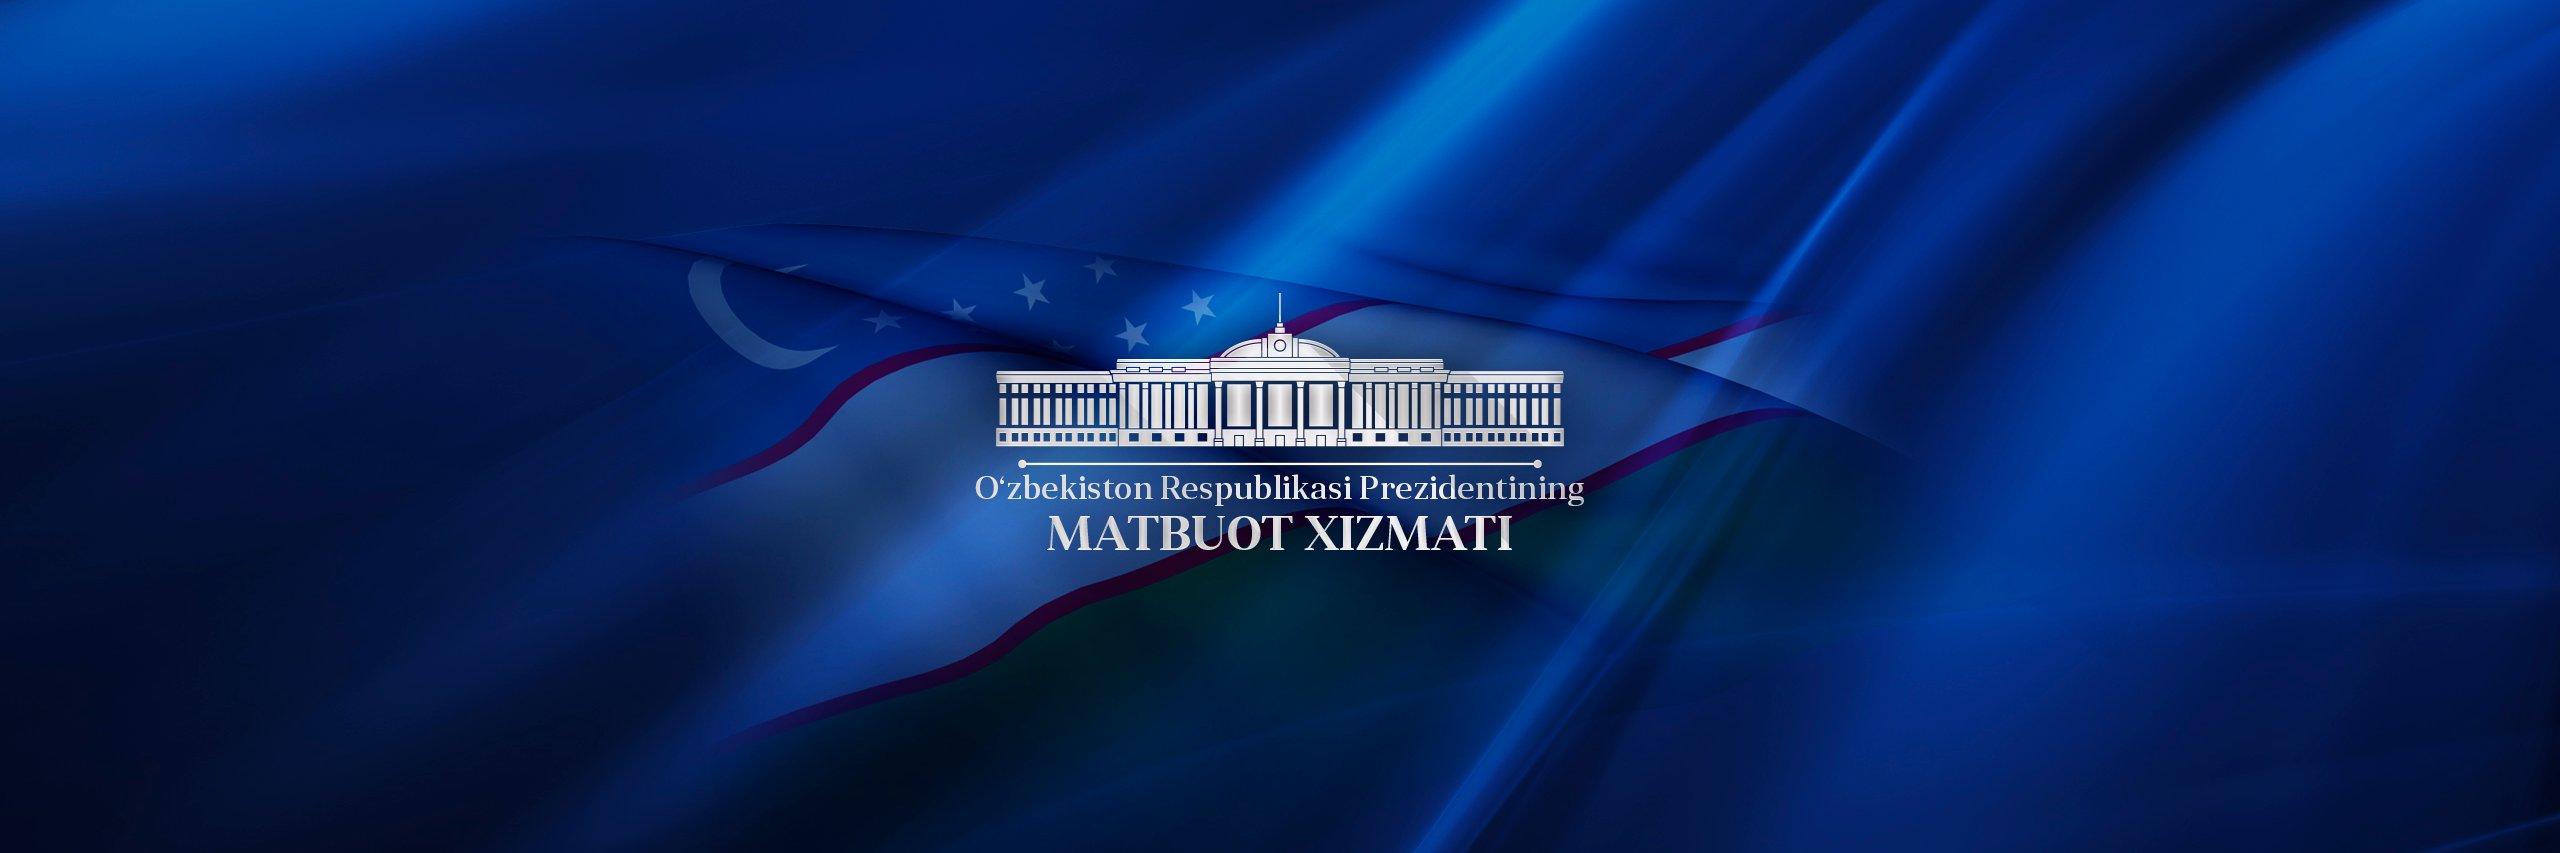 Shavkat Mirziyoyevs Press-service